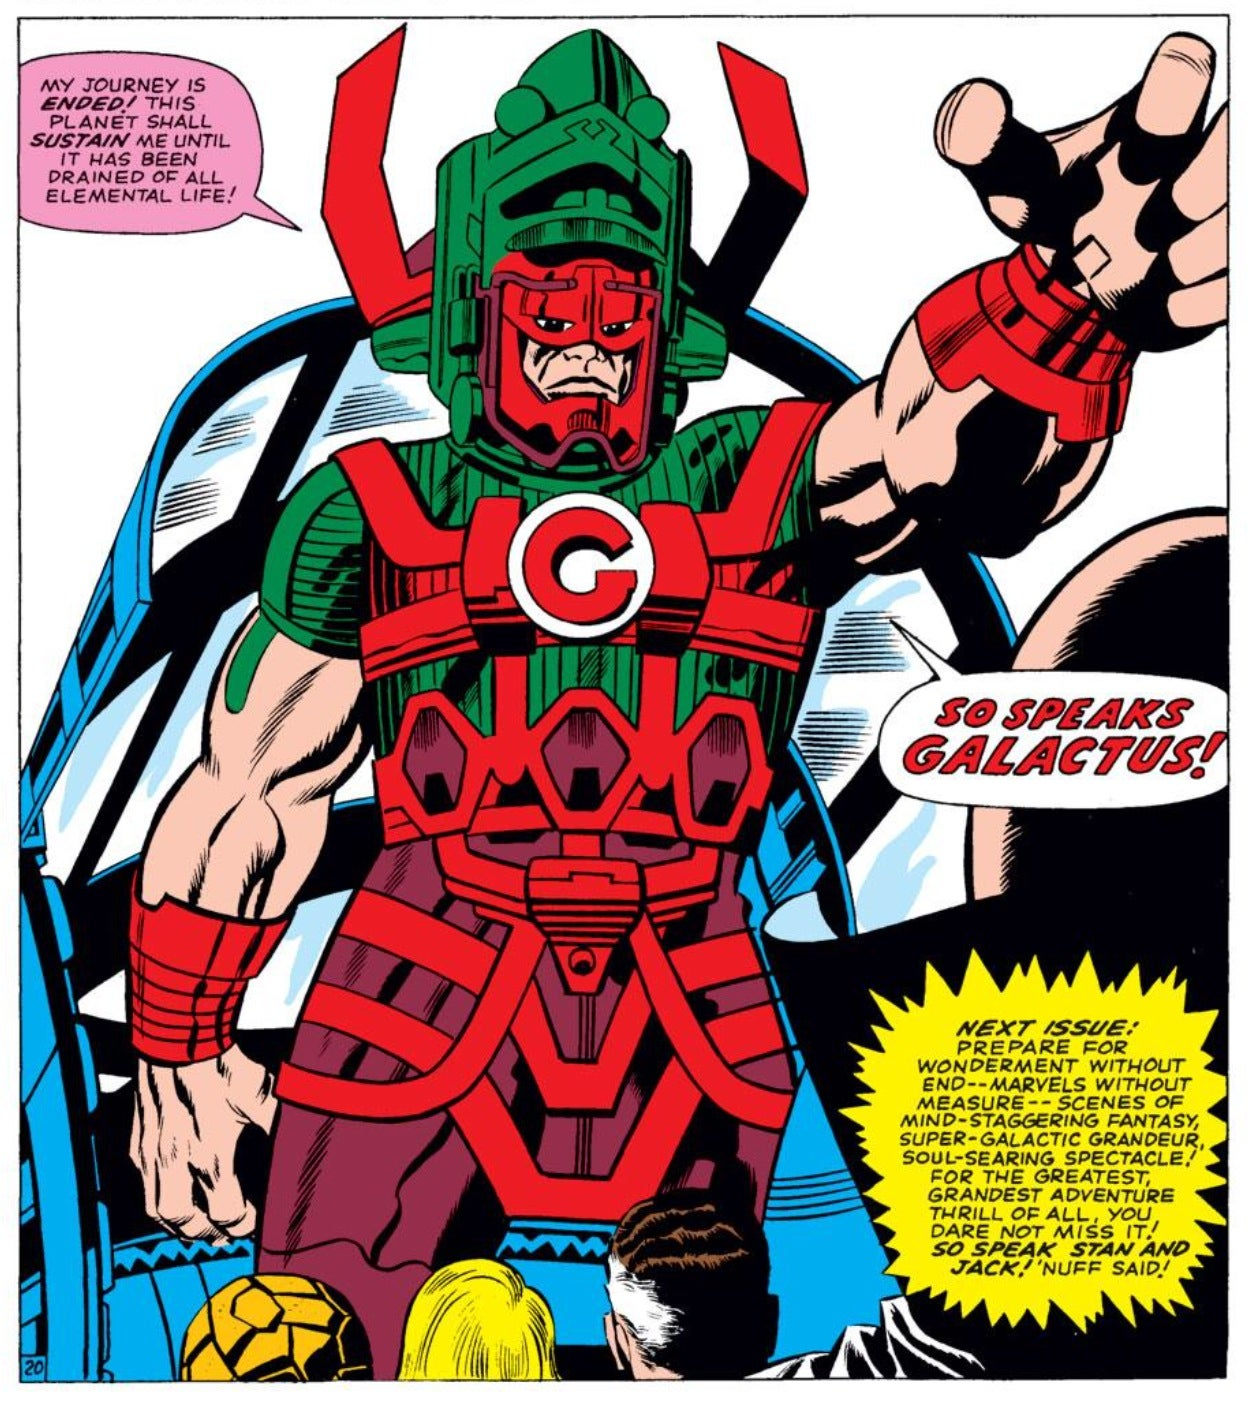 75 Most Iconic Marvel Comics Moments 15 1